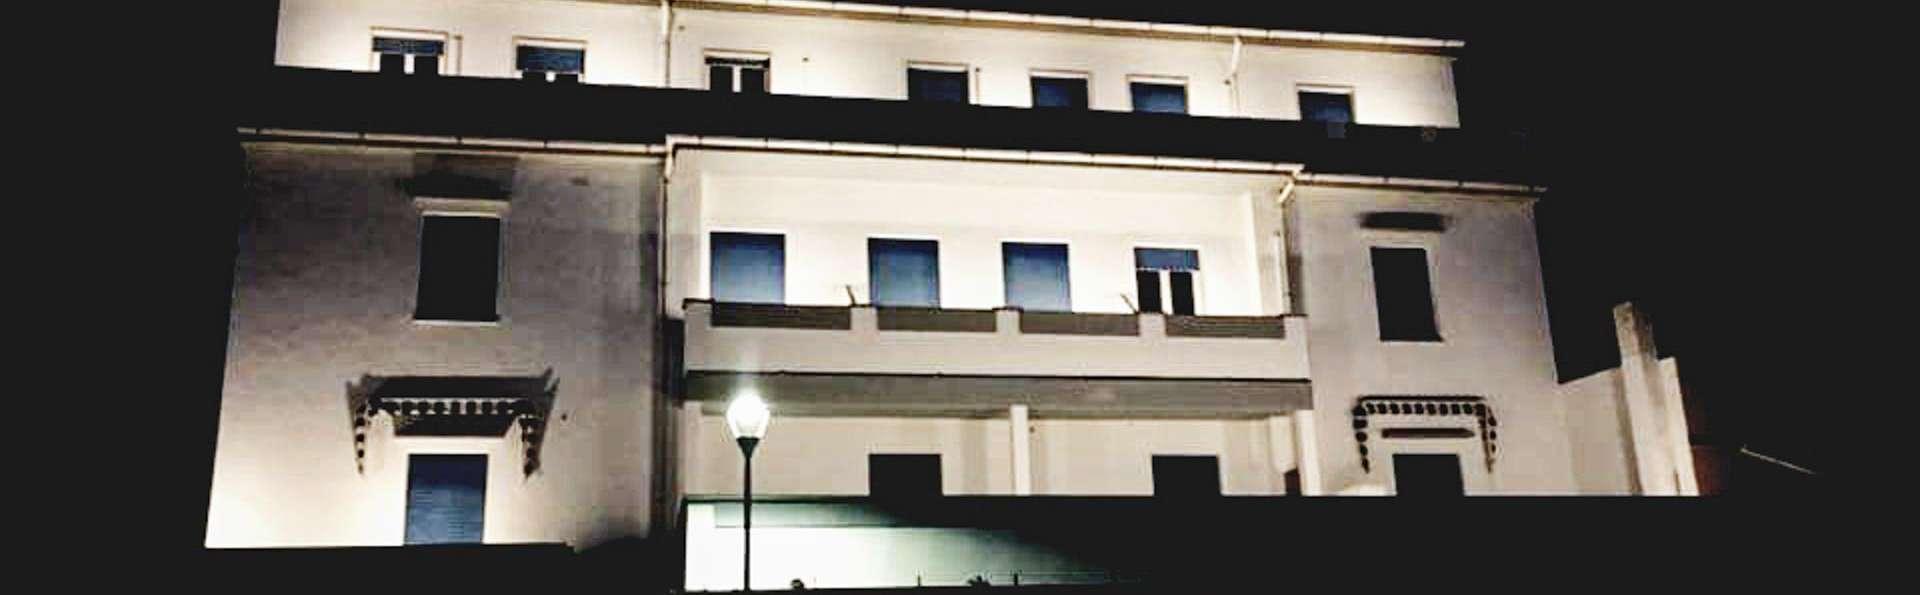 Hotel Villa dei Gerani - EDIT_FRONT_01.jpg